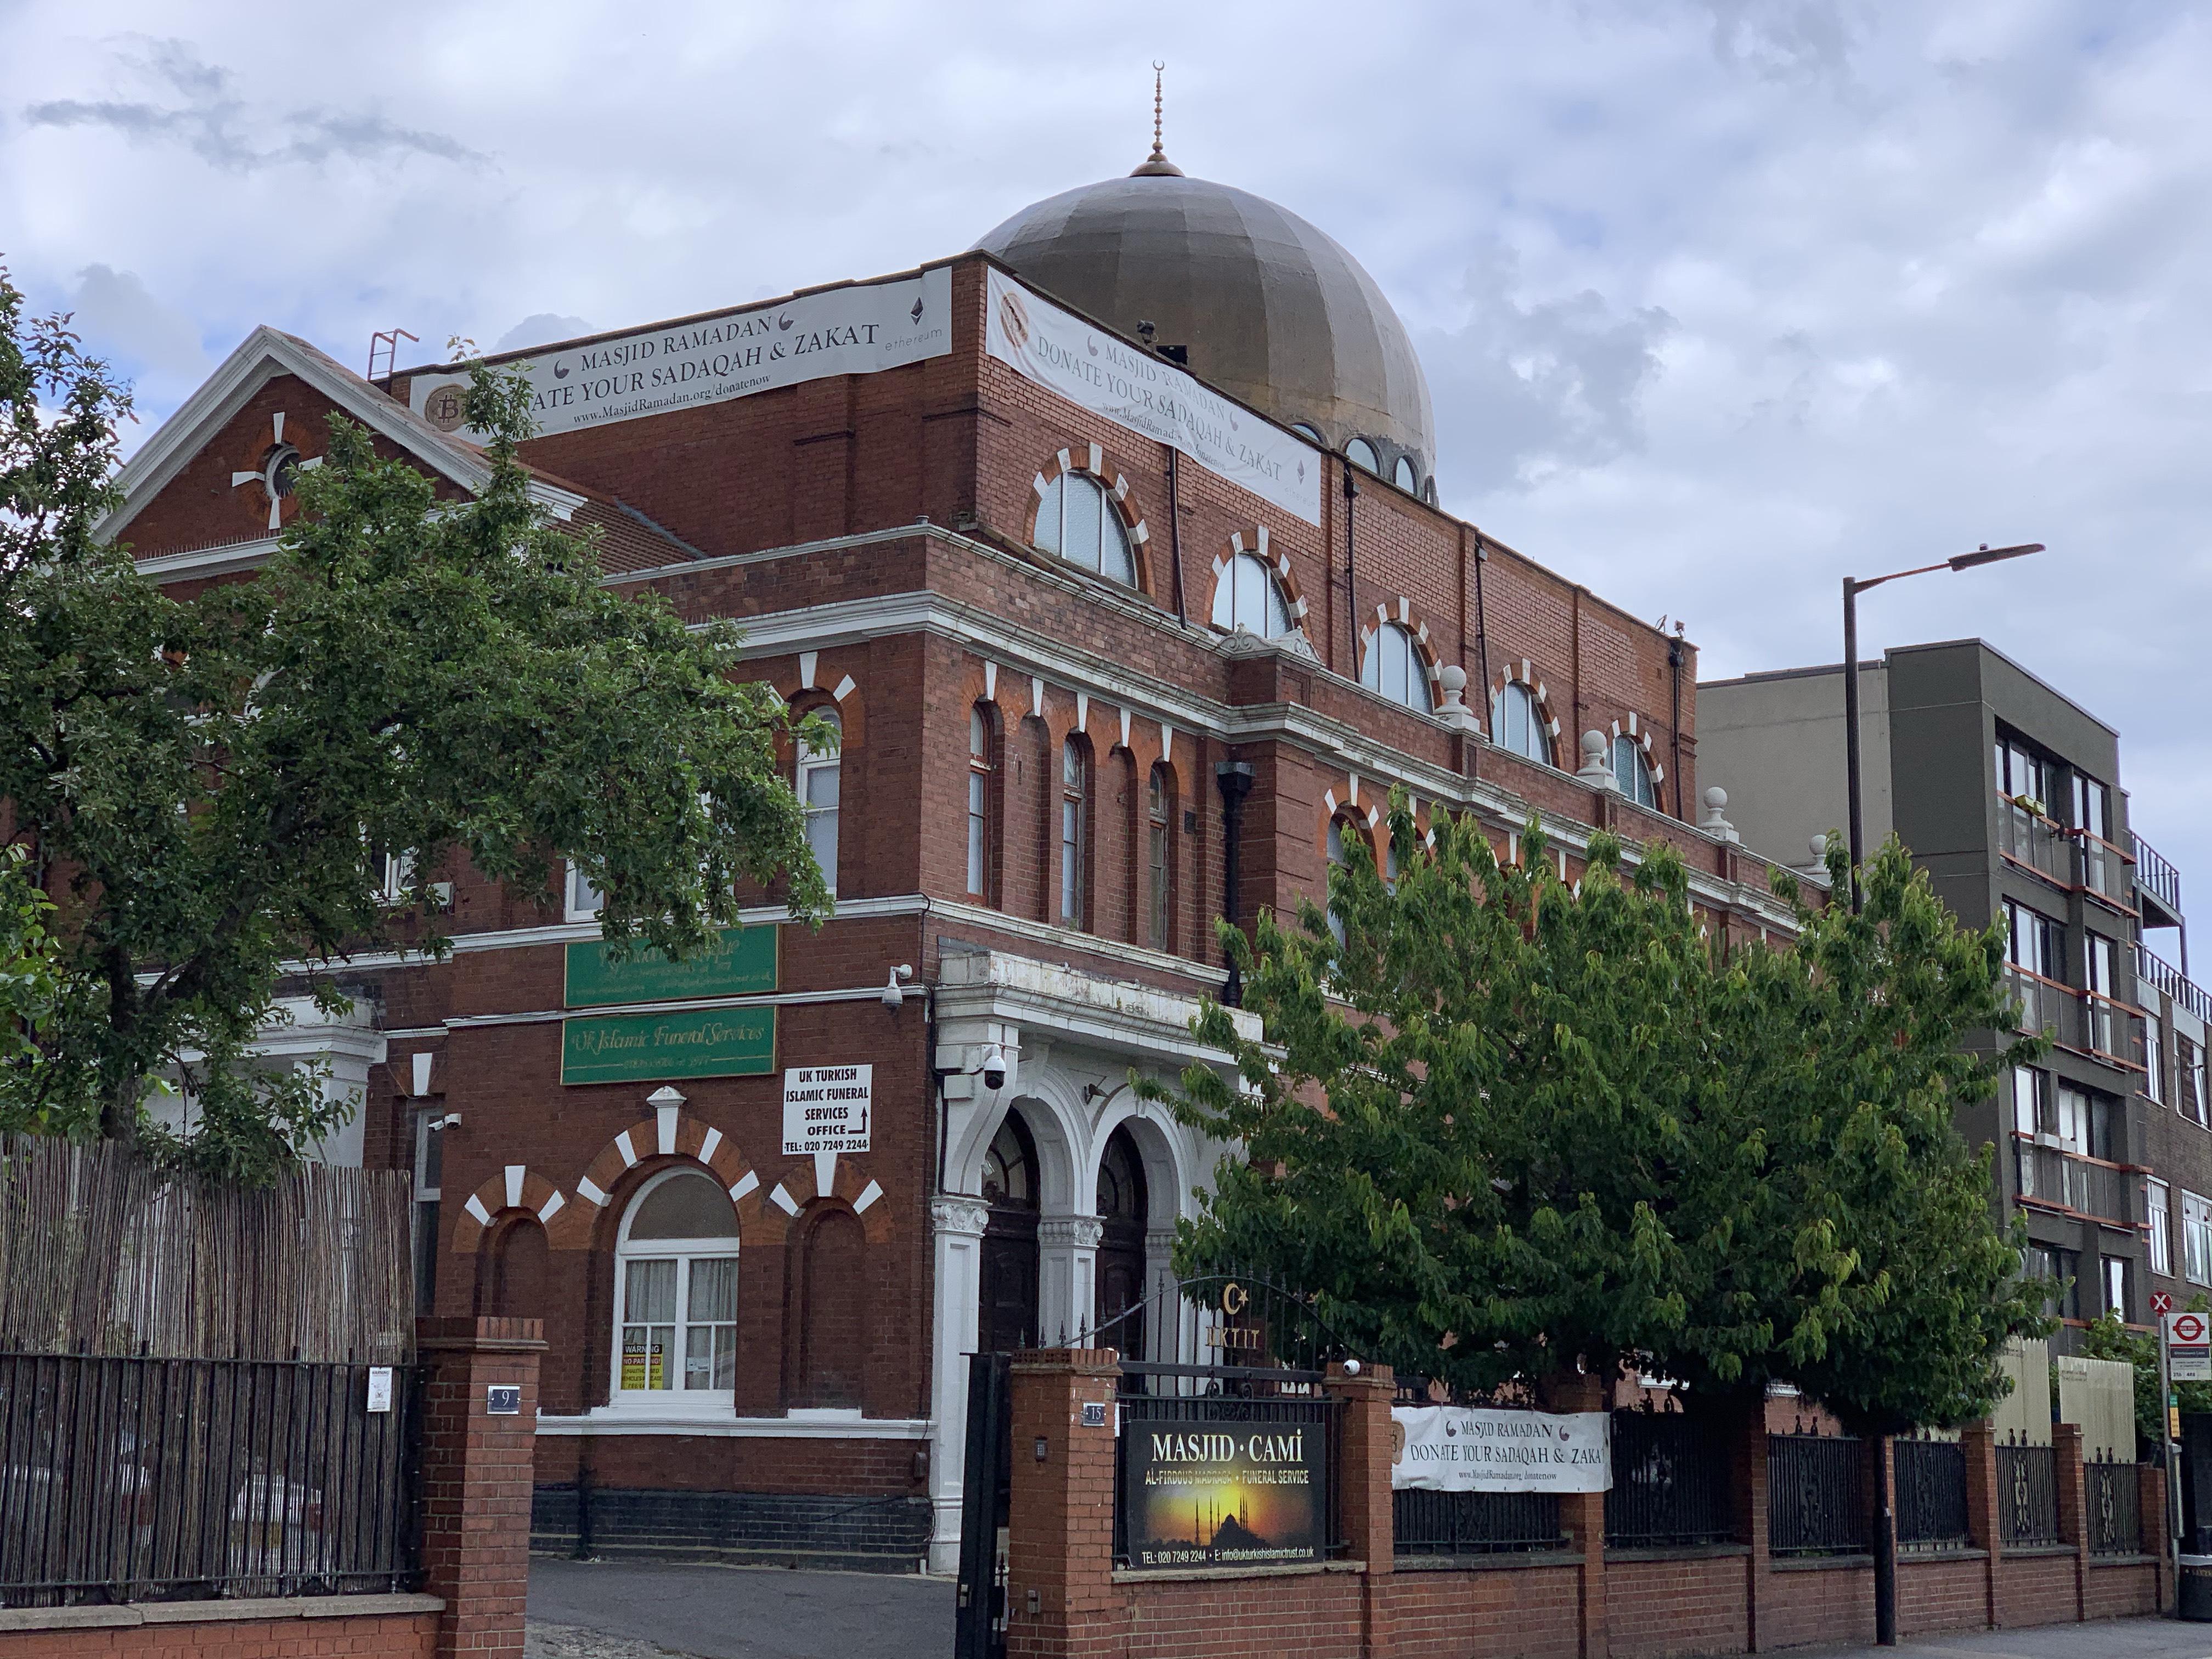 Shacklewell Lane Mosque